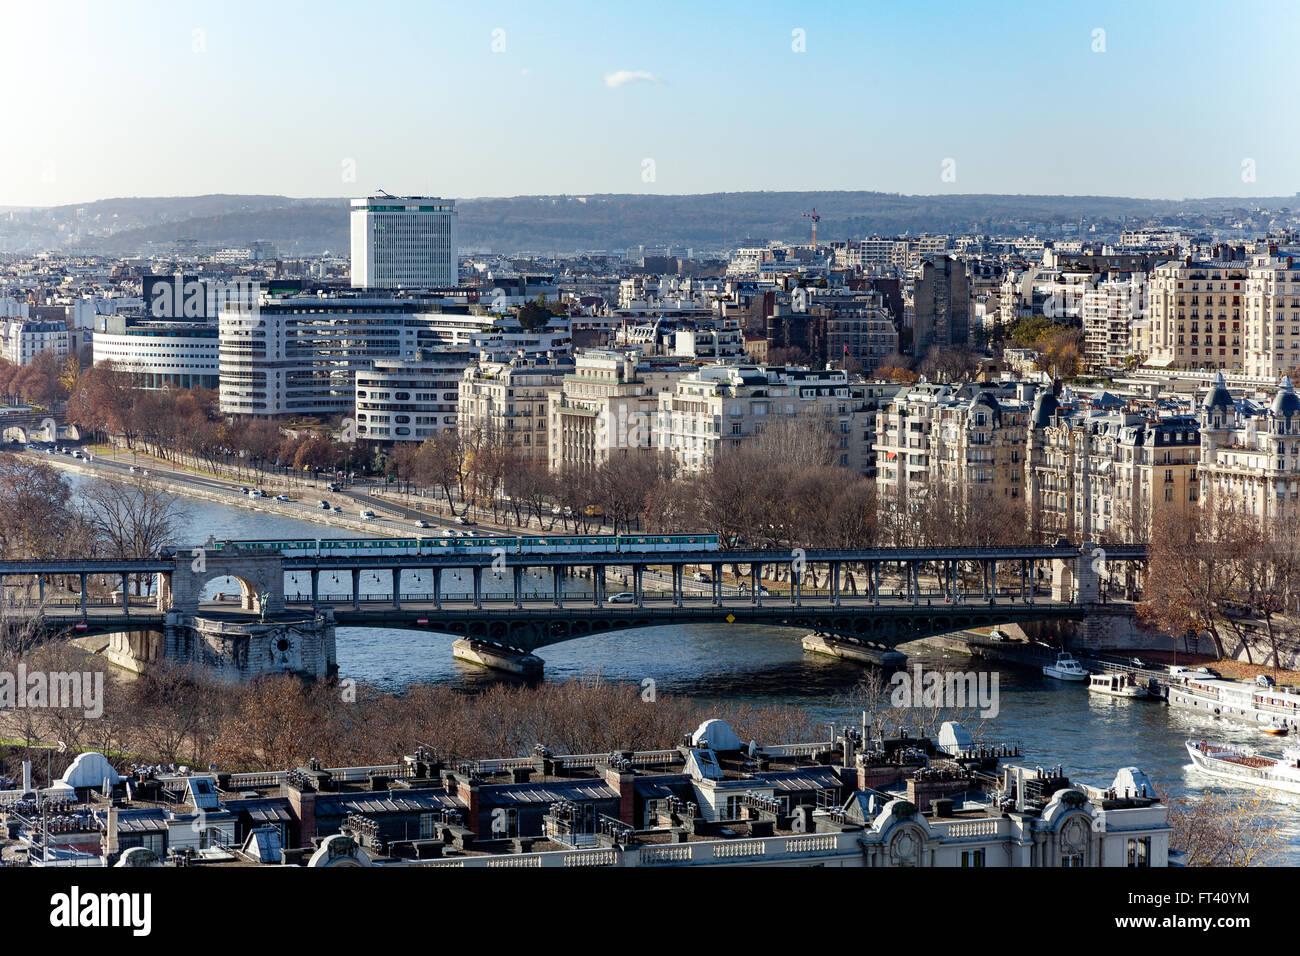 Parisian subway bridge over Seine river - Stock Image